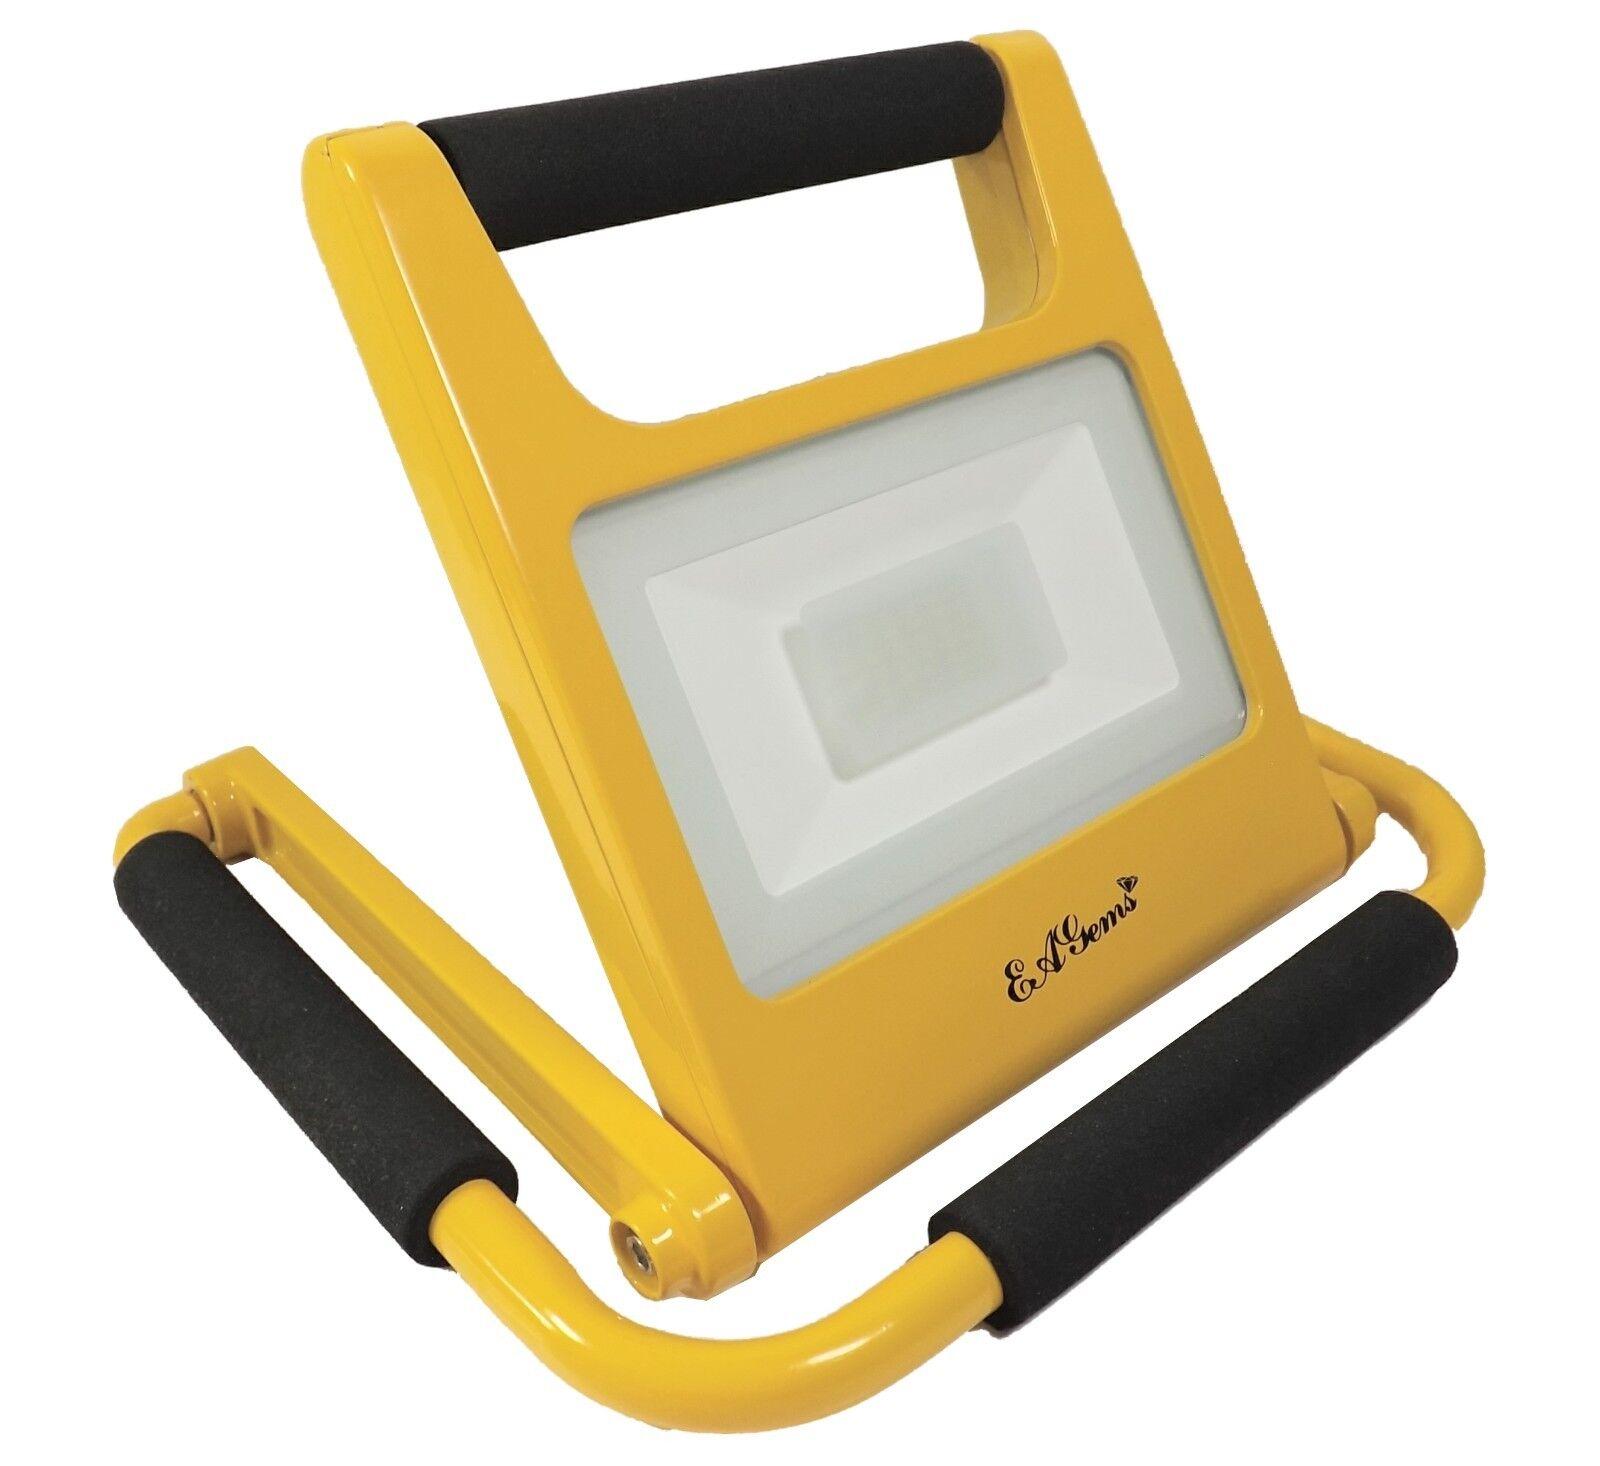 EAGems LED Work Light Rechargeable Portable Adjustable Flashlight Spotlight 20W